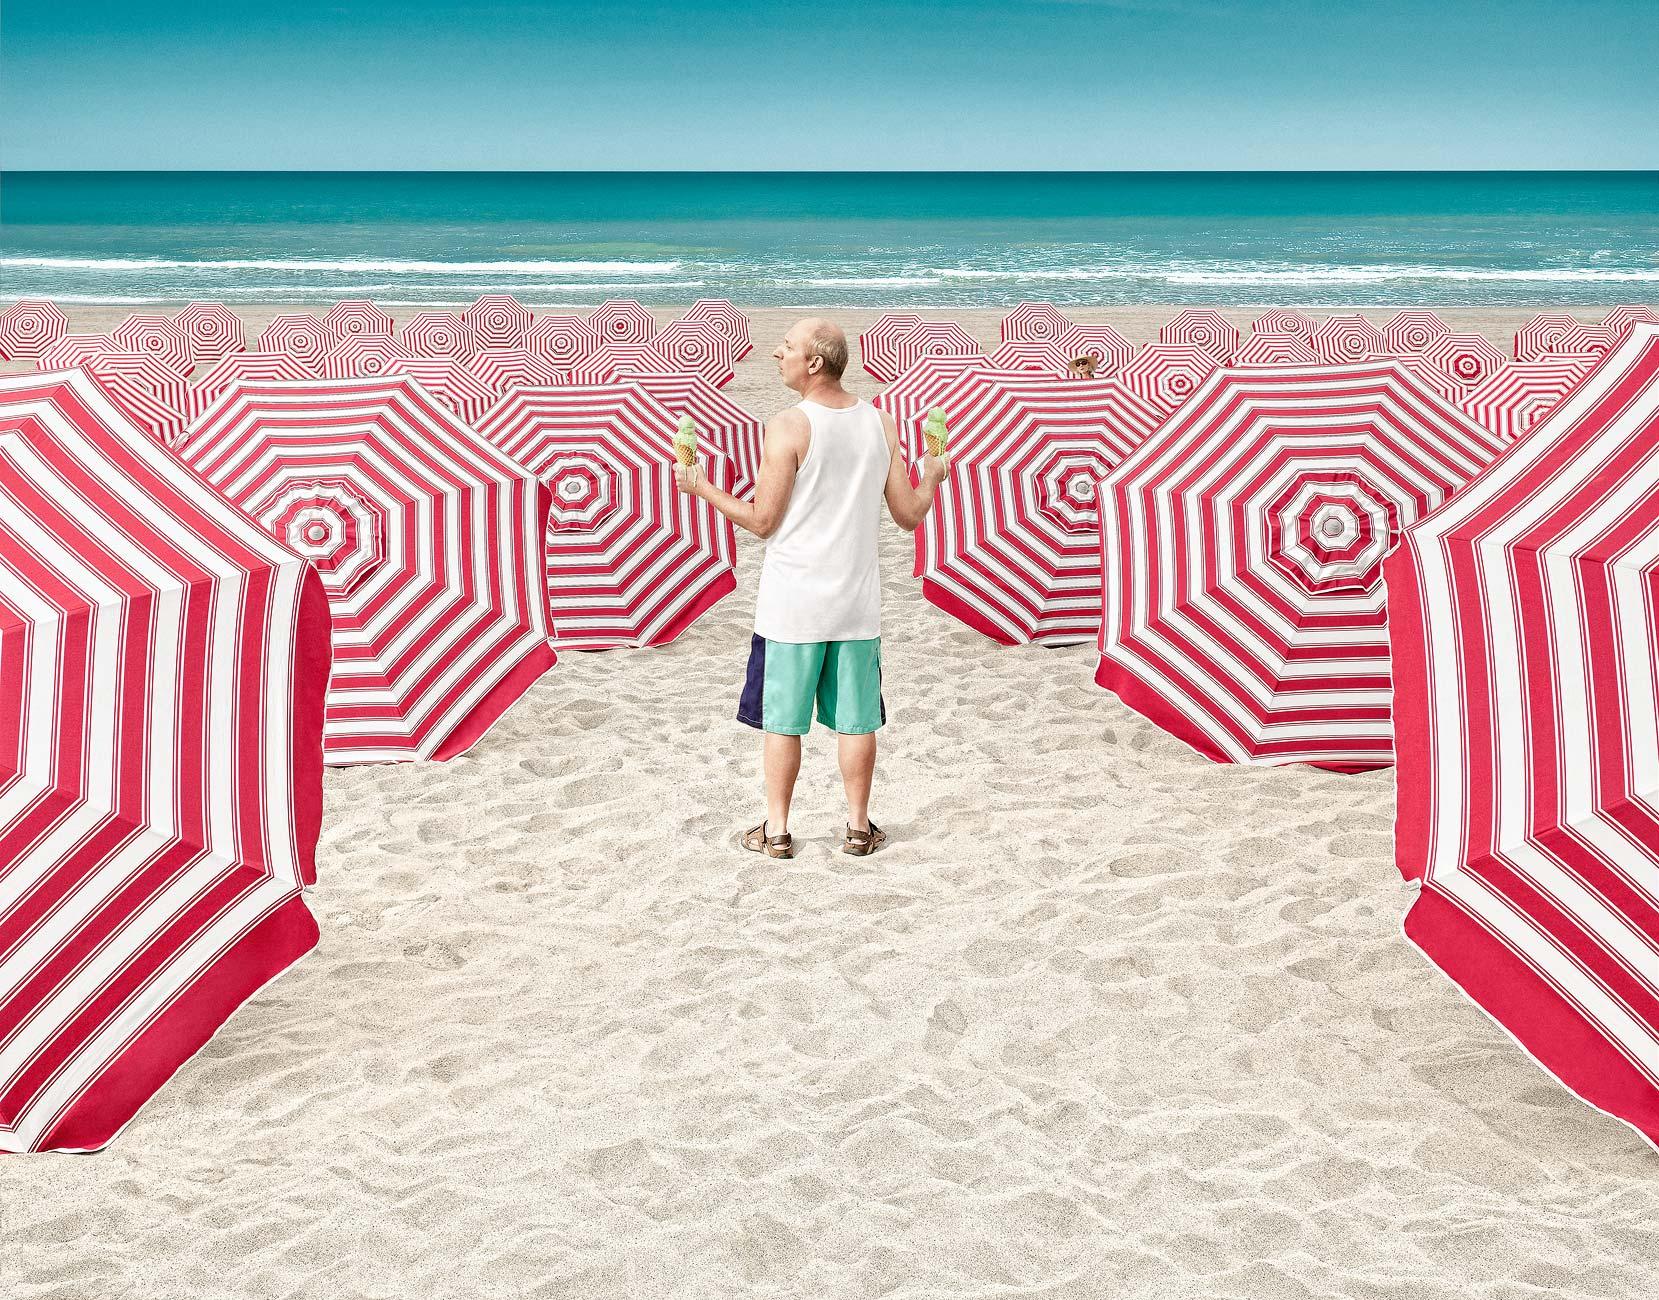 aarp_beach_ford1.jpg